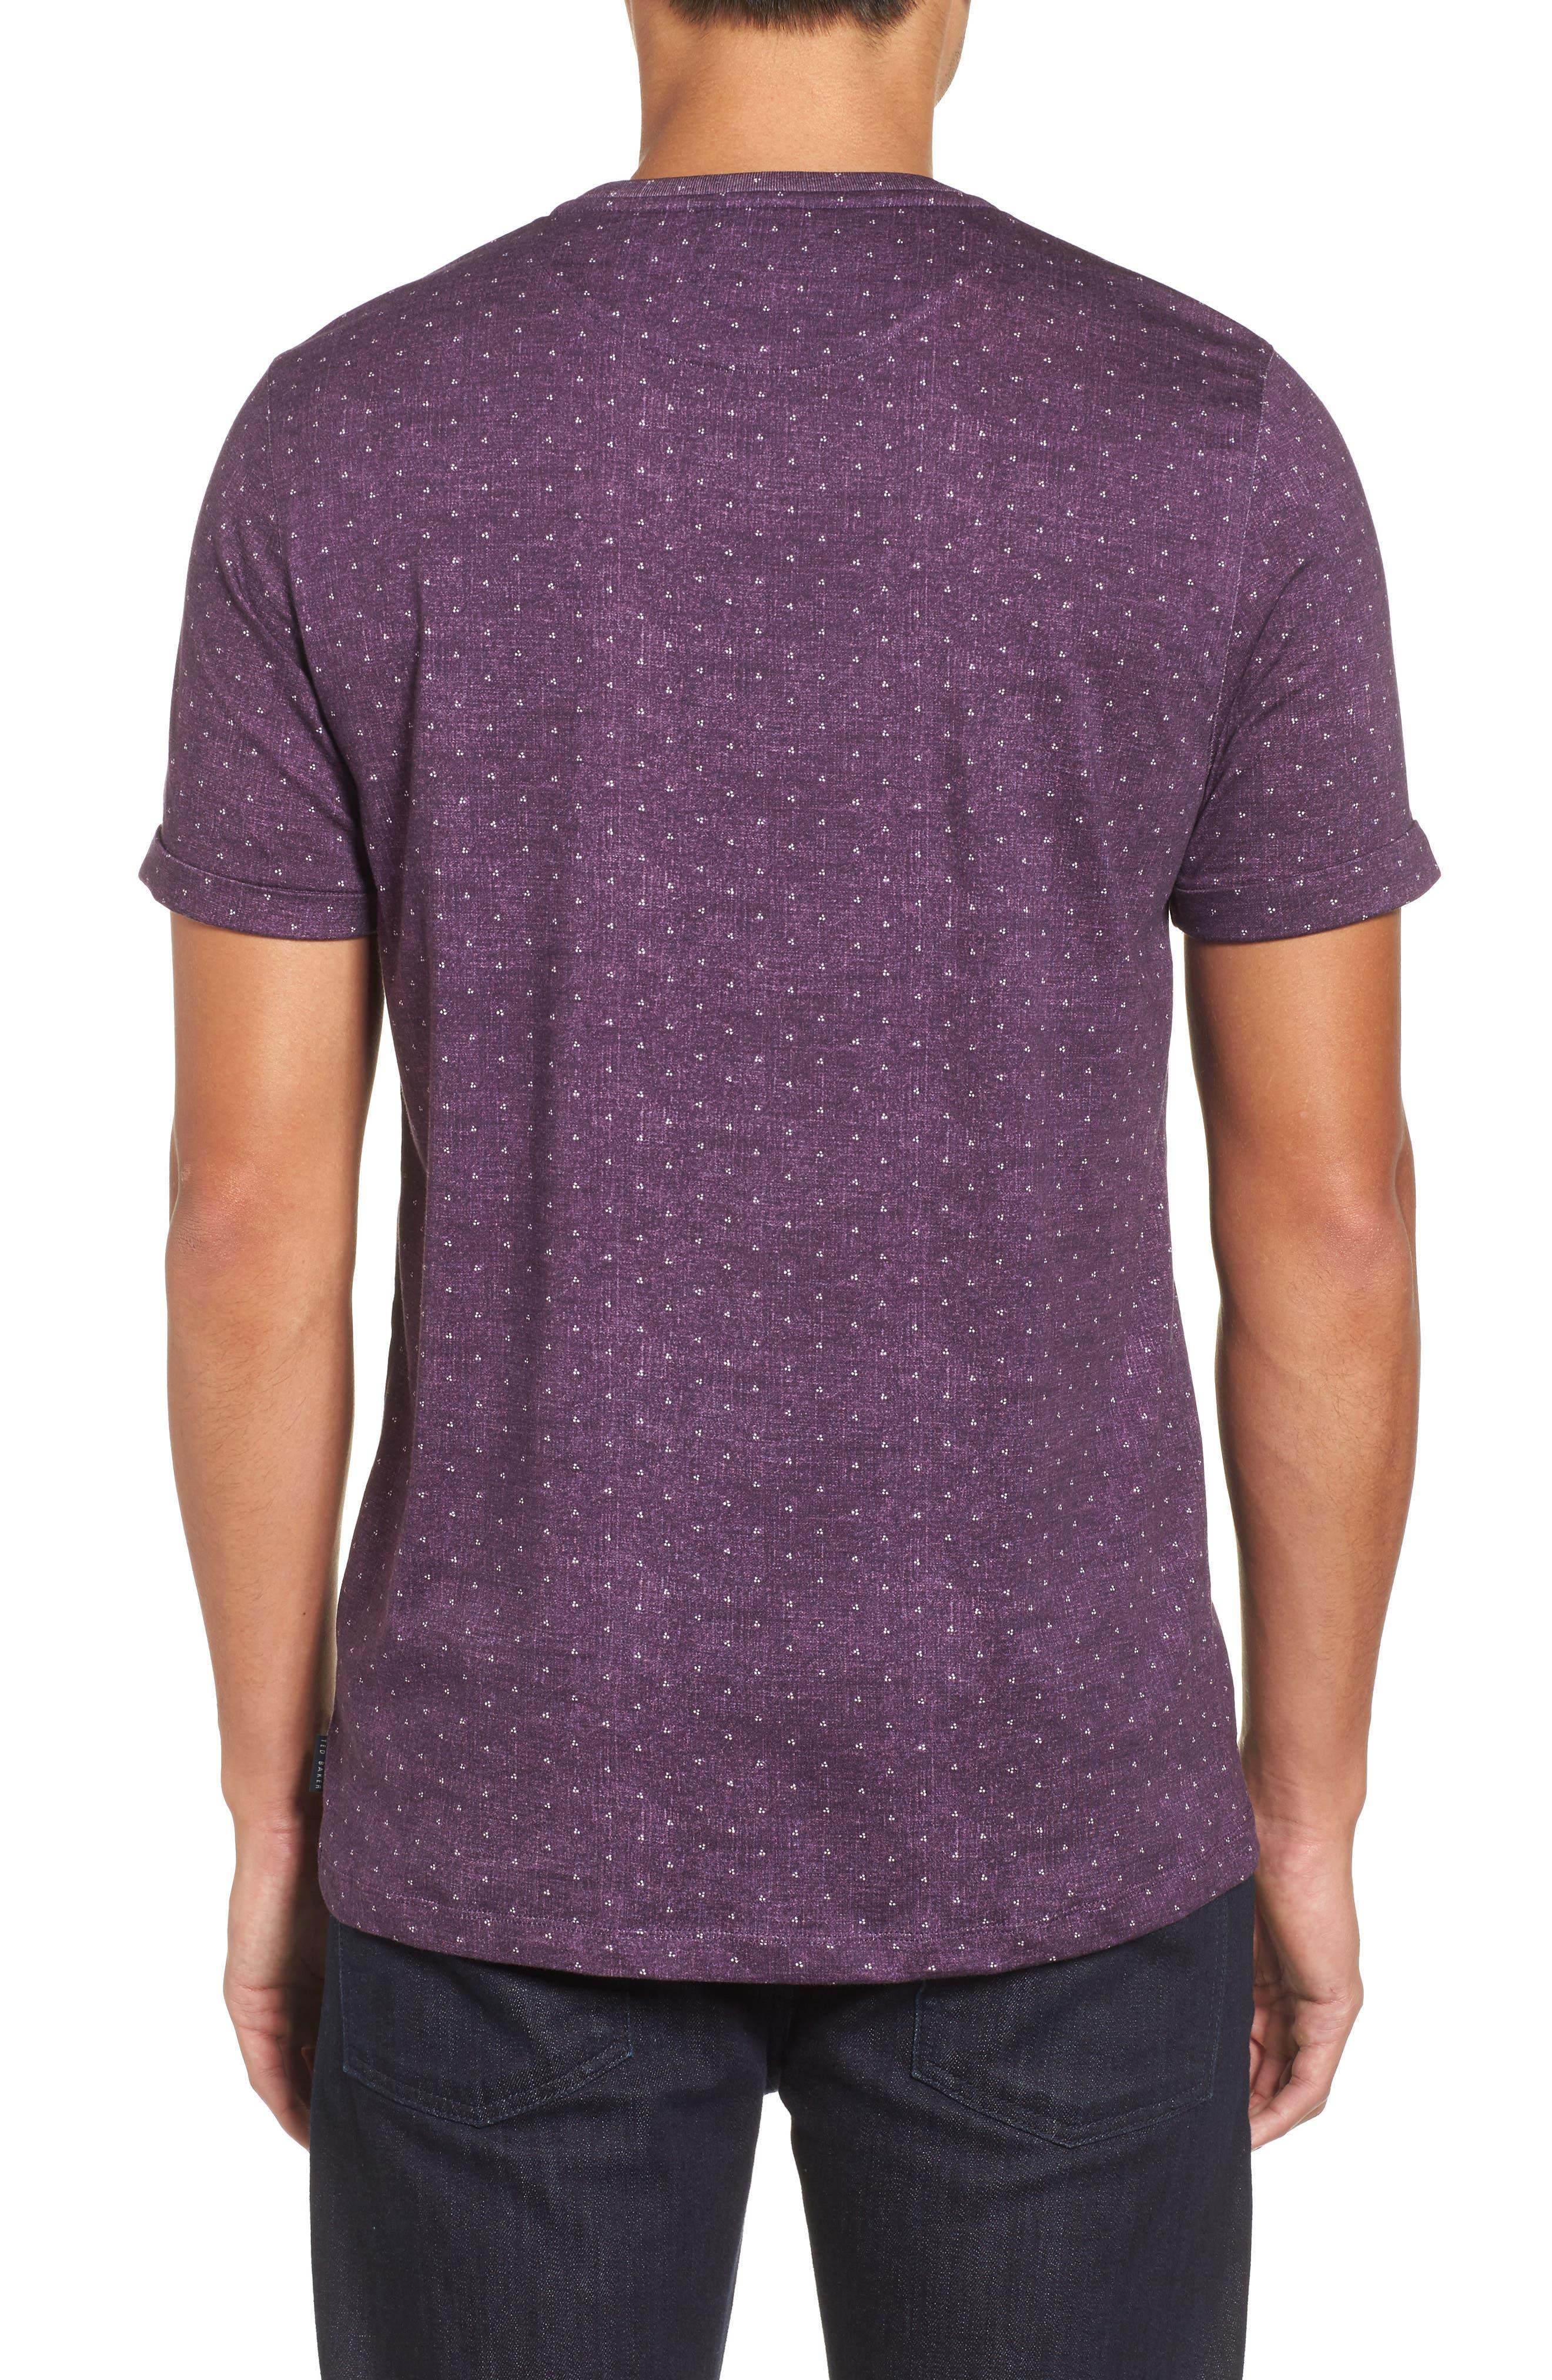 Giovani Modern Slim Fit Print T-Shirt,                             Alternate thumbnail 2, color,                             Purple